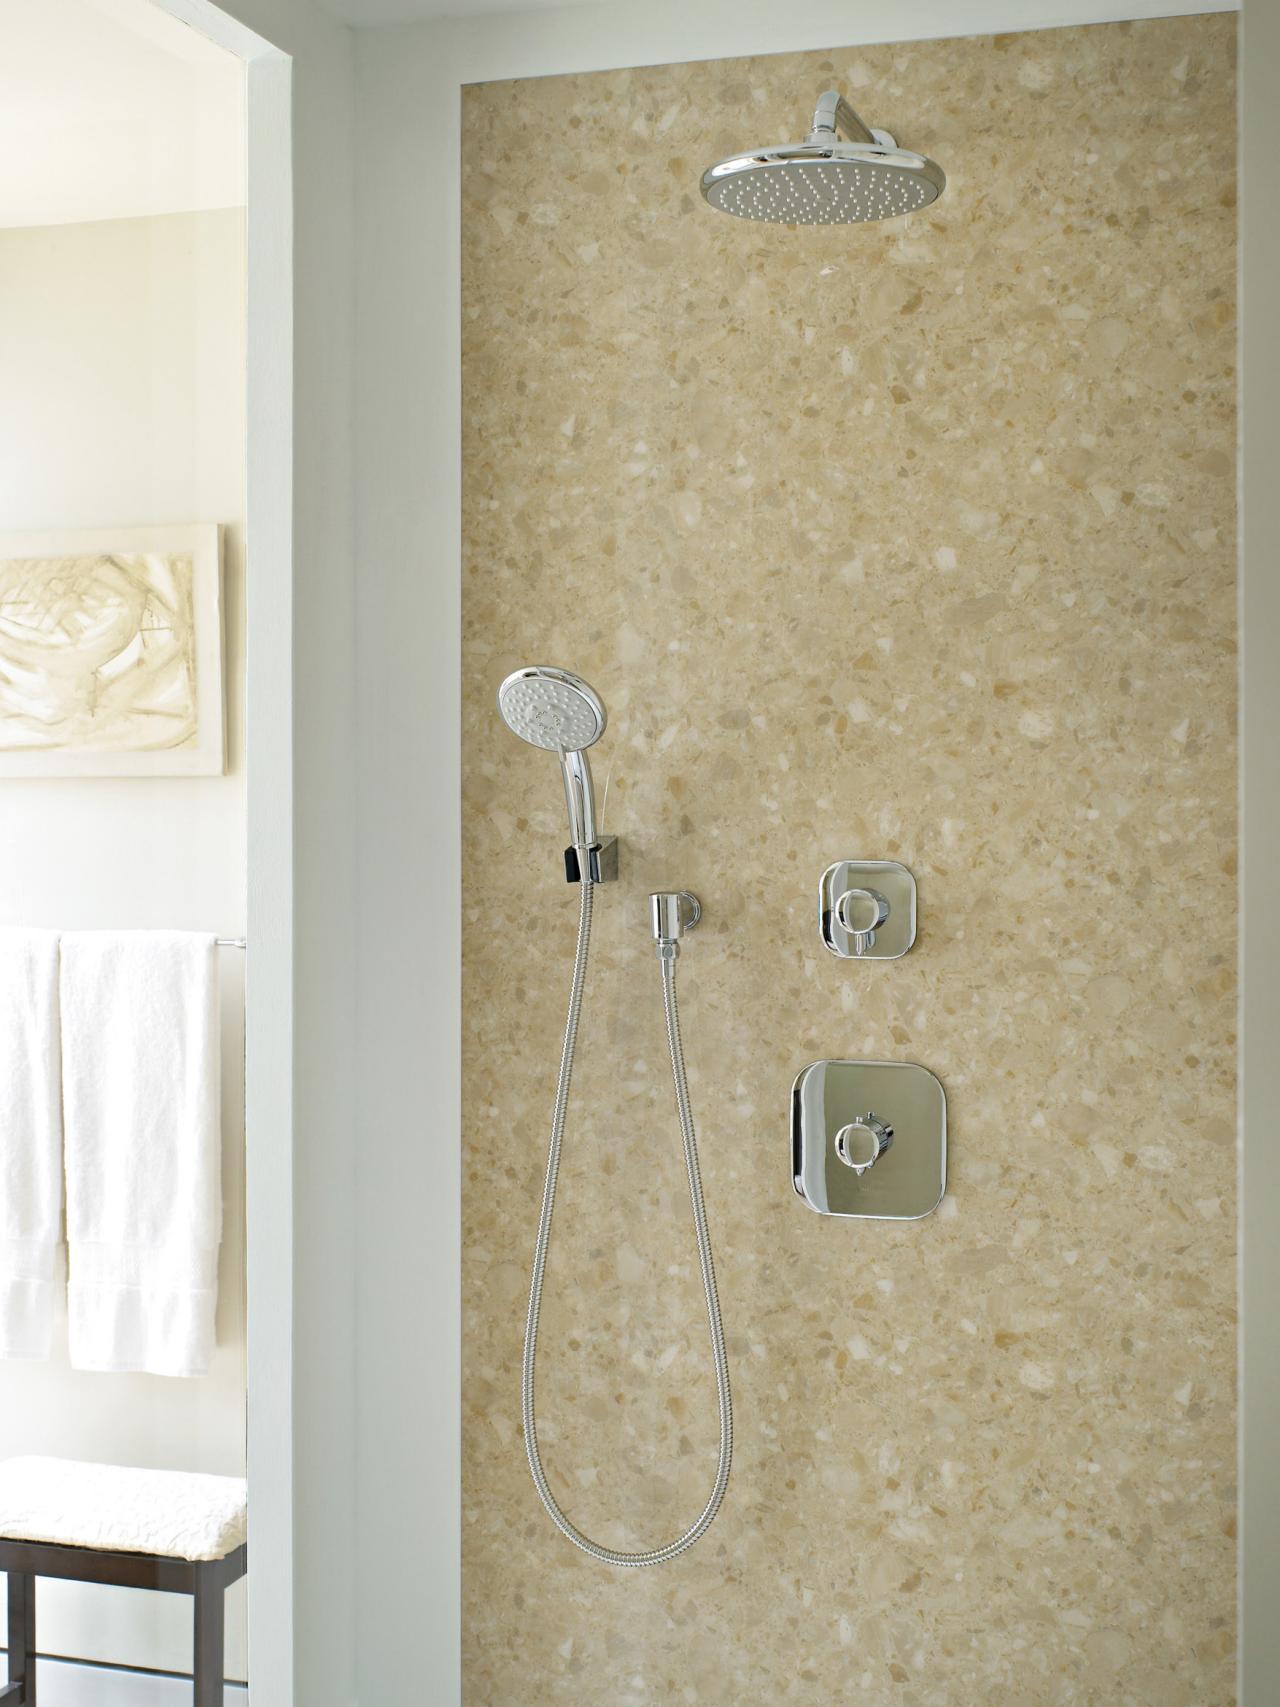 bathroom space planning | hgtv